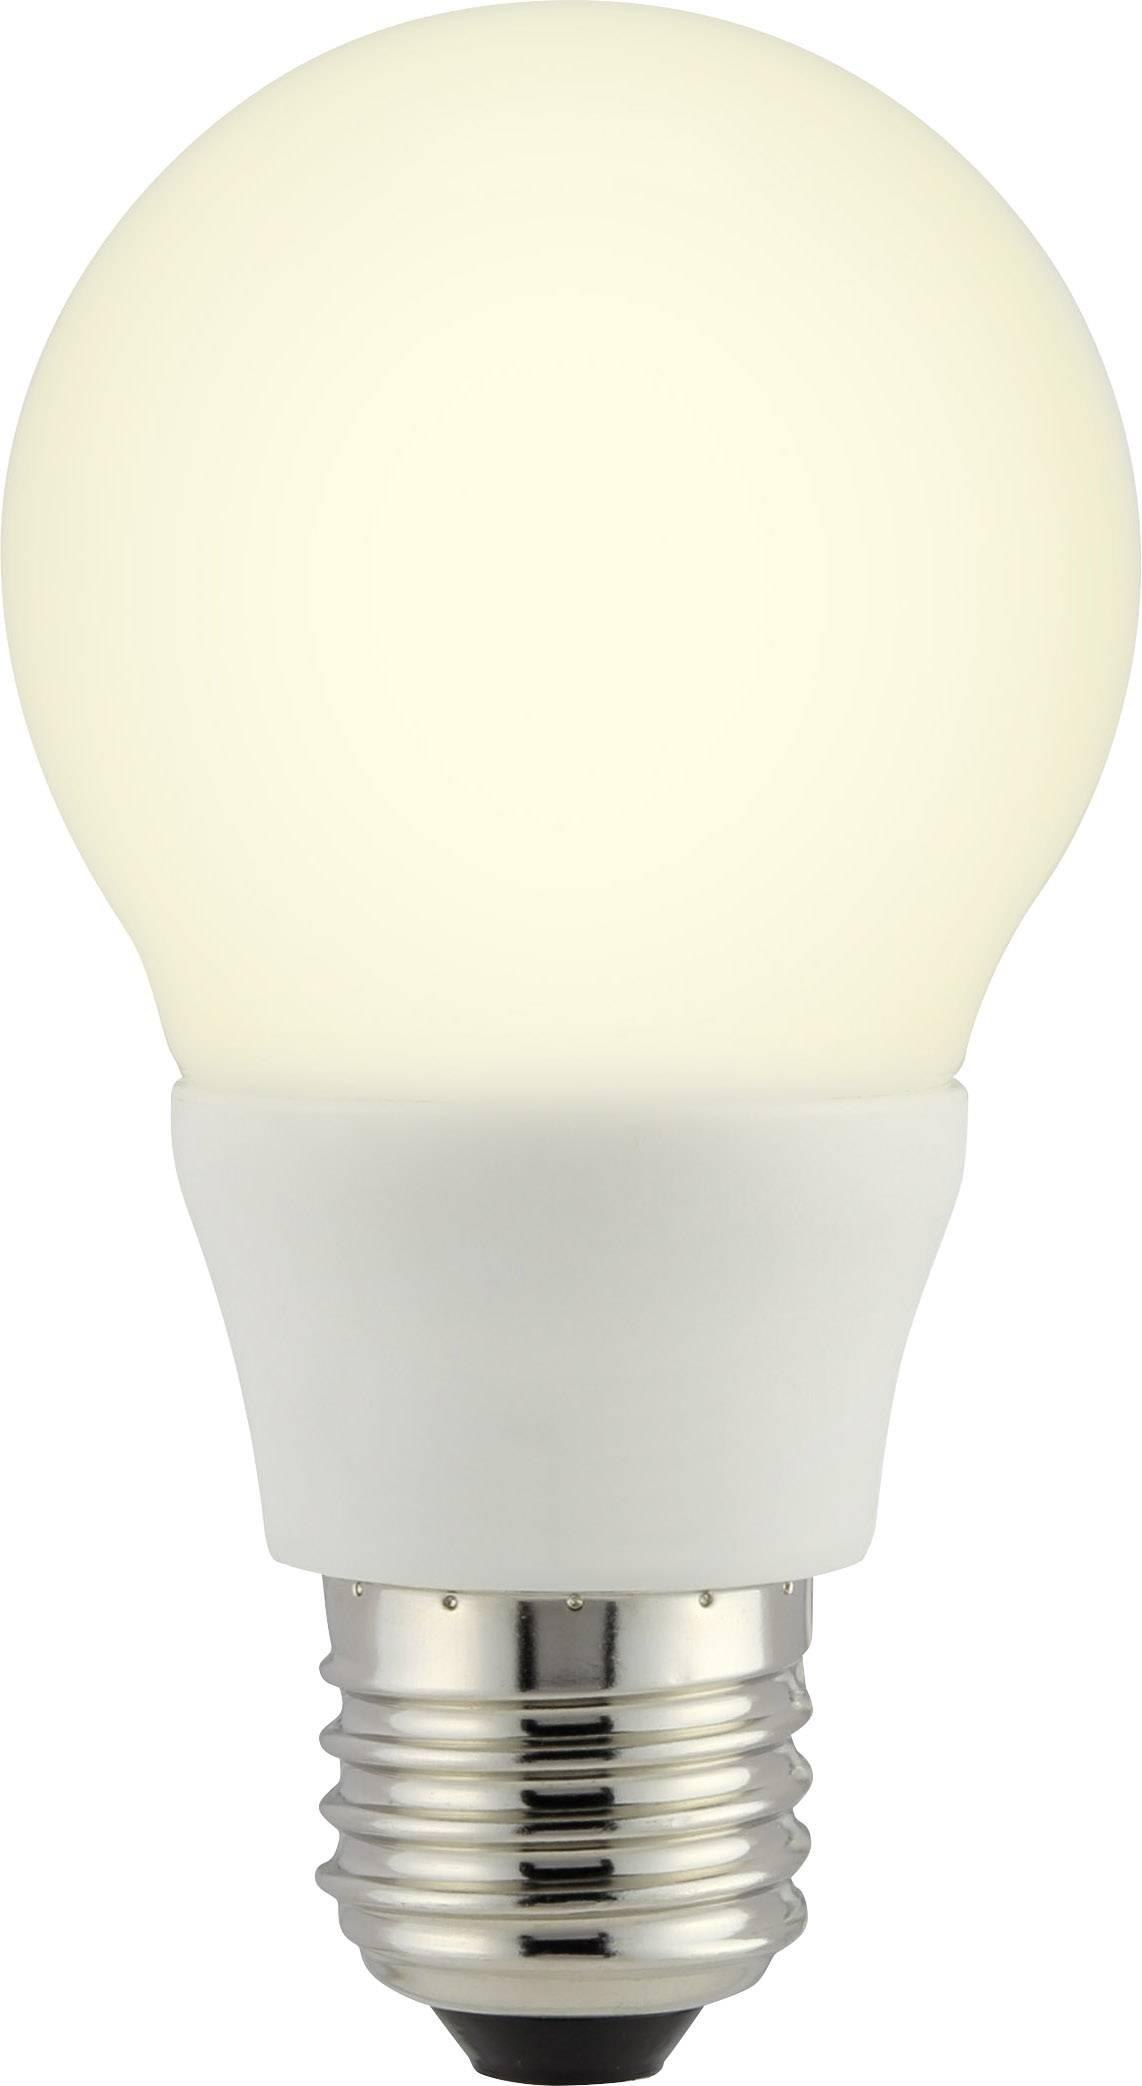 LED žiarovka 110 mm sygonix 230 V E27 6.5 W = 40 W 1 ks